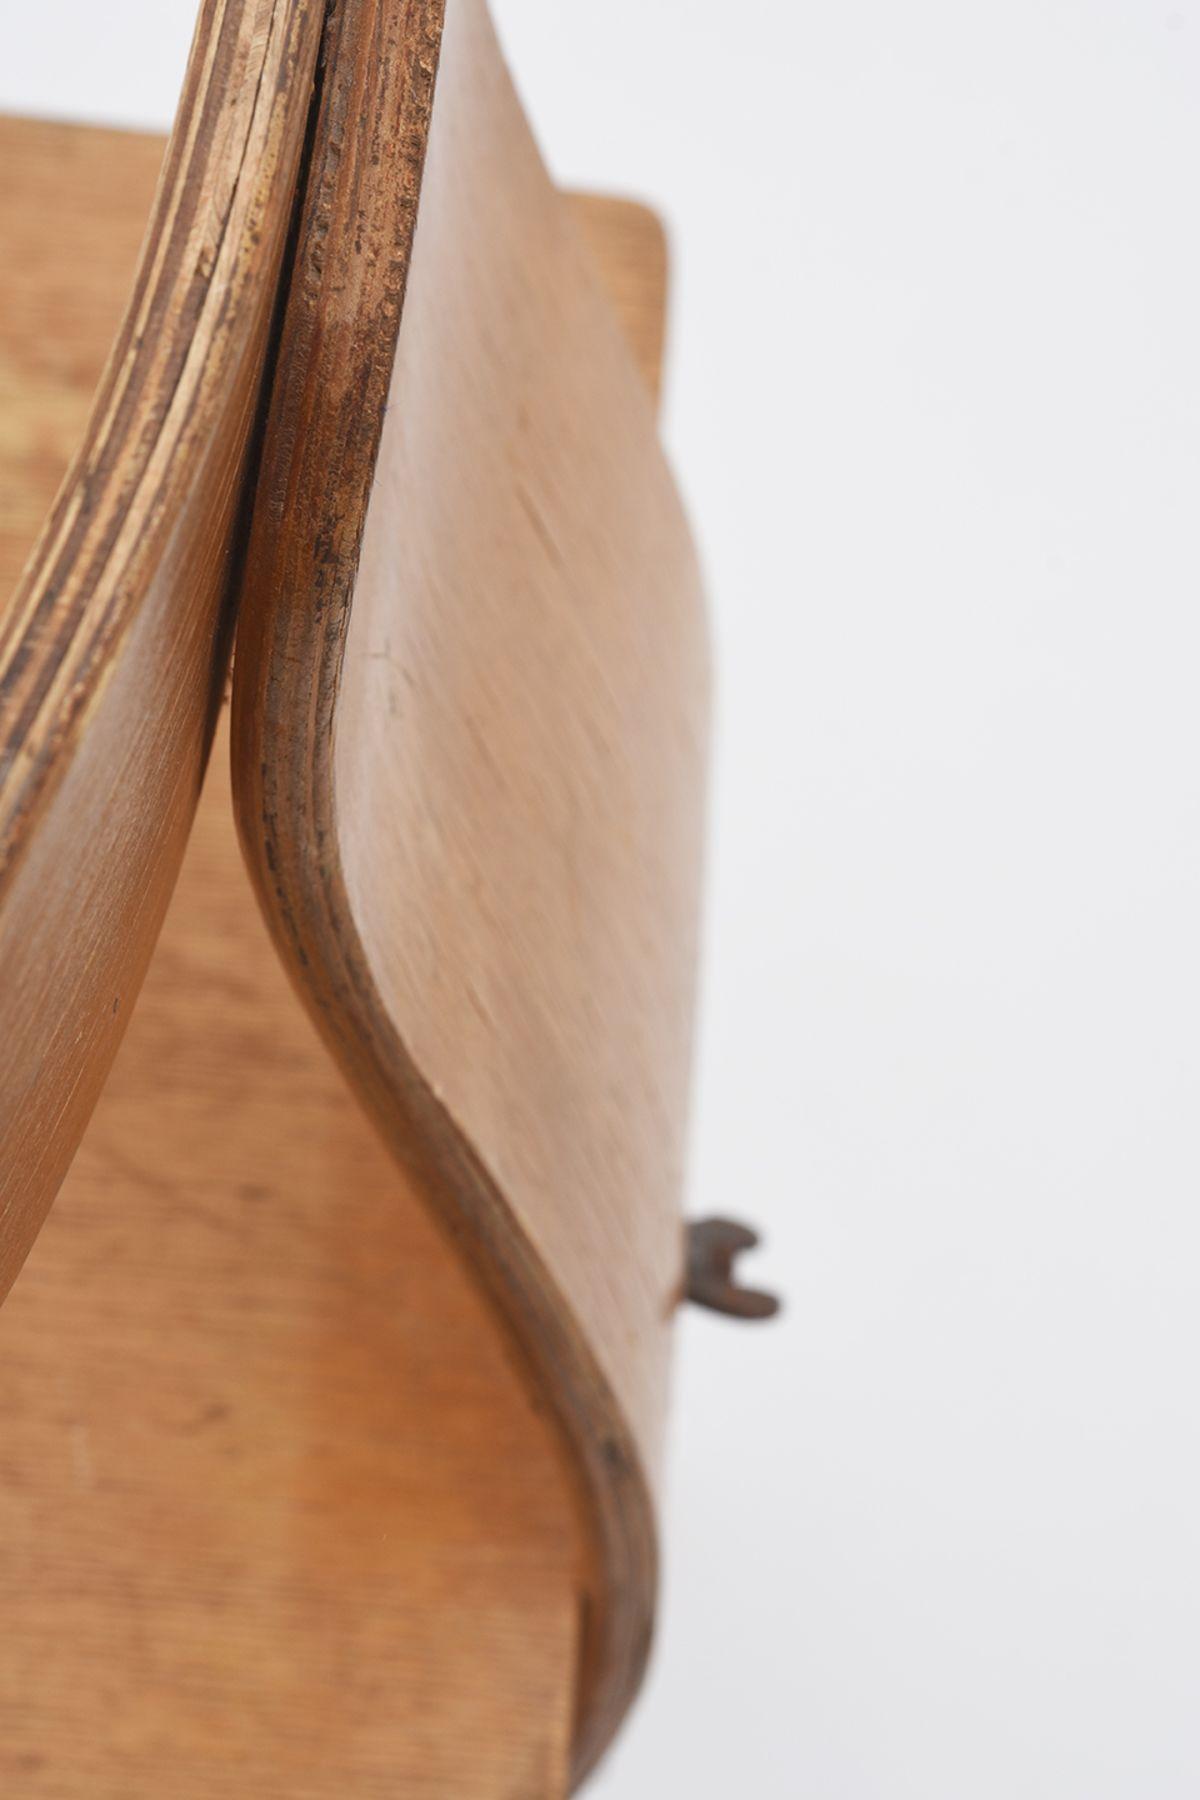 Wooden-Indutrial-Chair_Detail-01